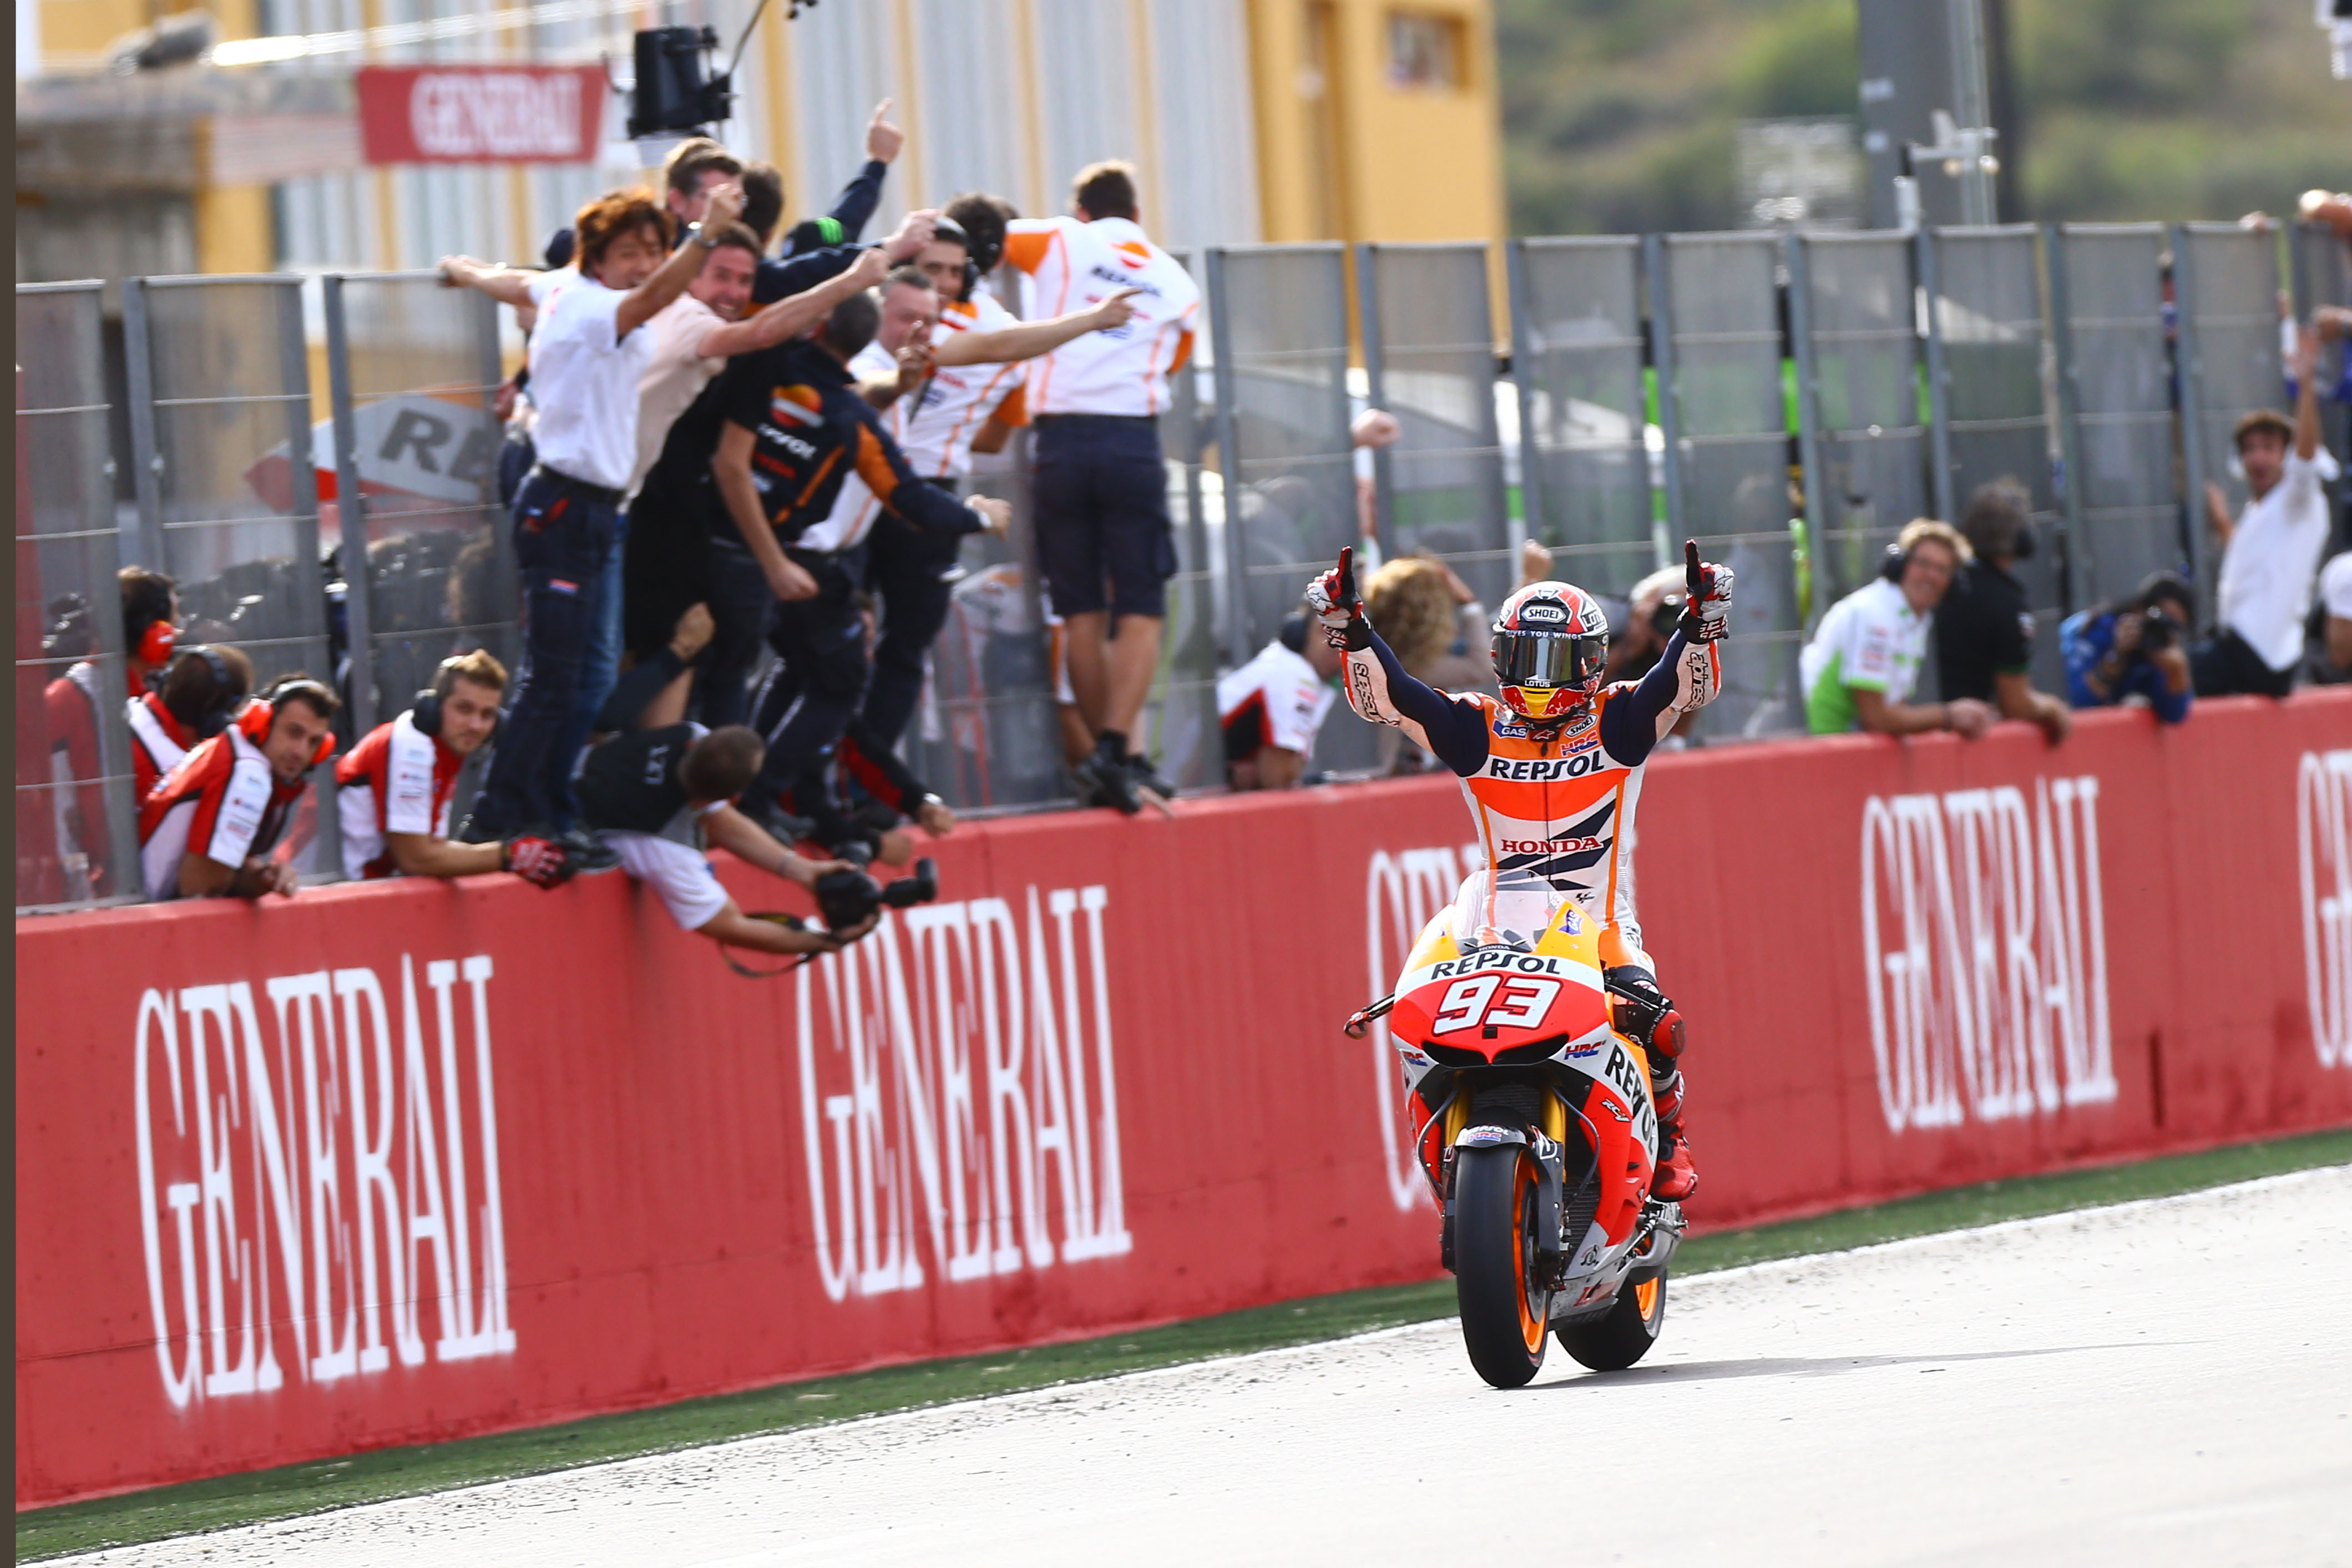 Marc Marquez, Repsol Honda, Valencia MotoGP 2013,